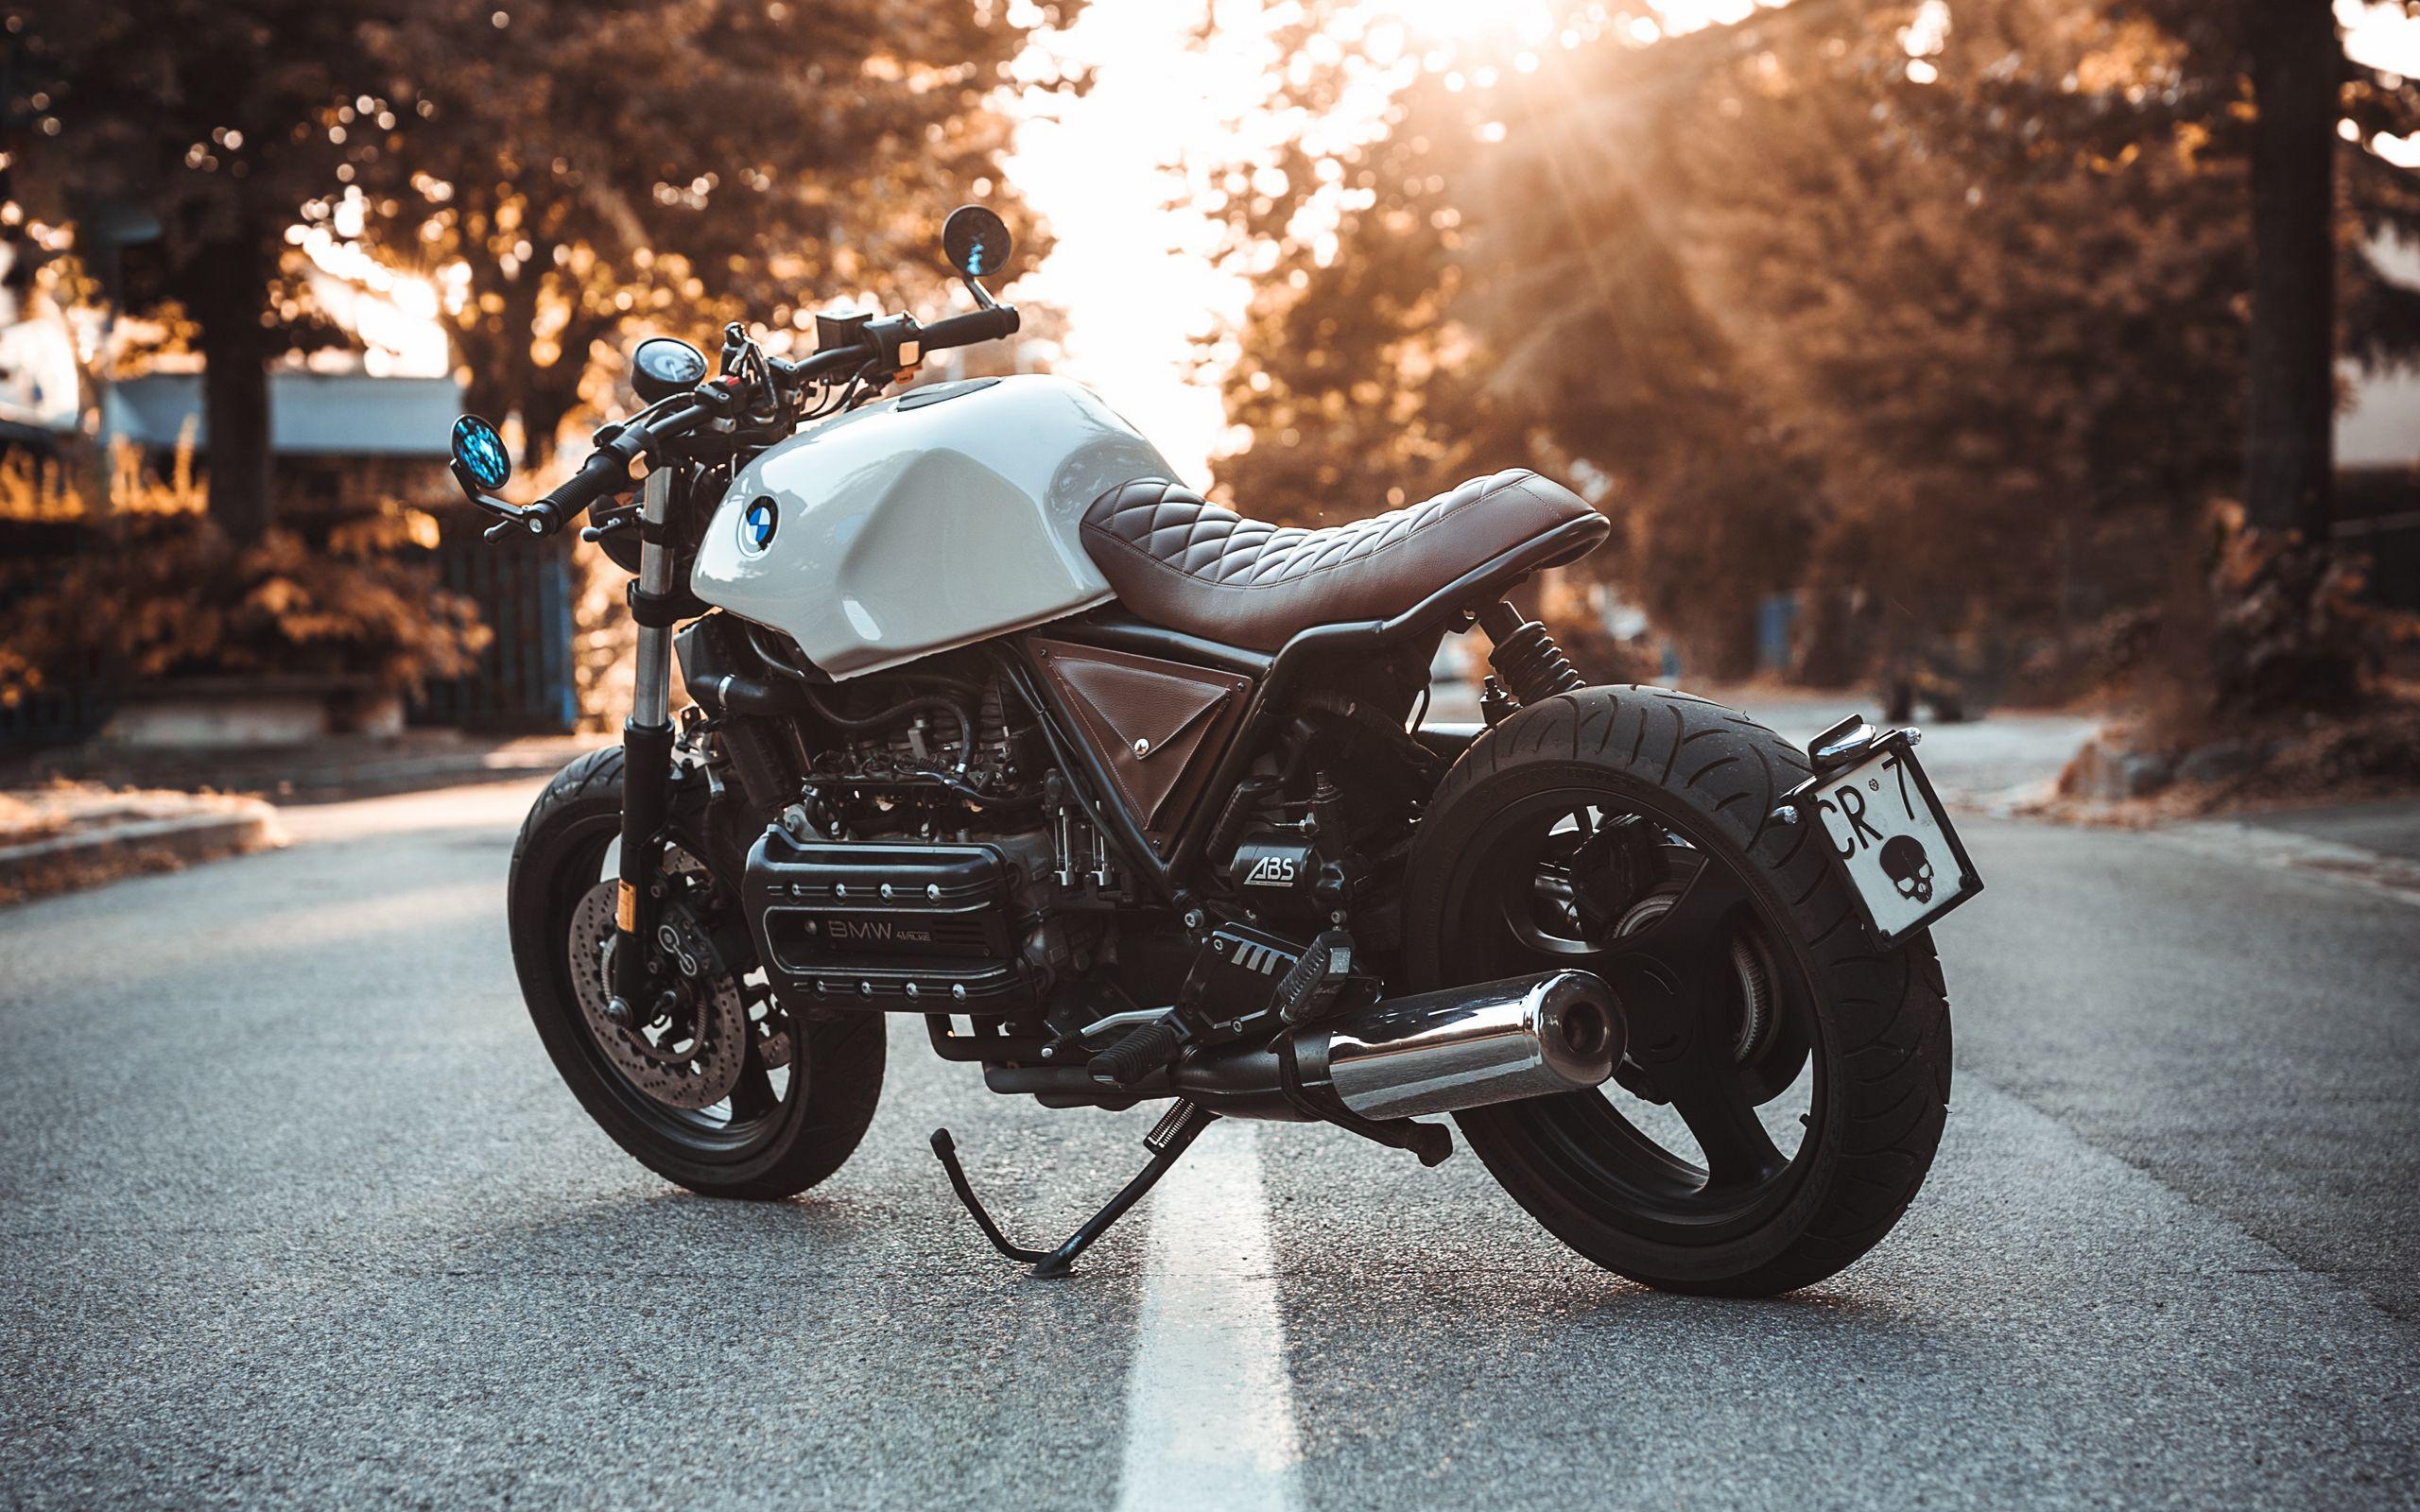 2560x1600 Обои bmw k100, мотоцикл, байк, вид сбоку